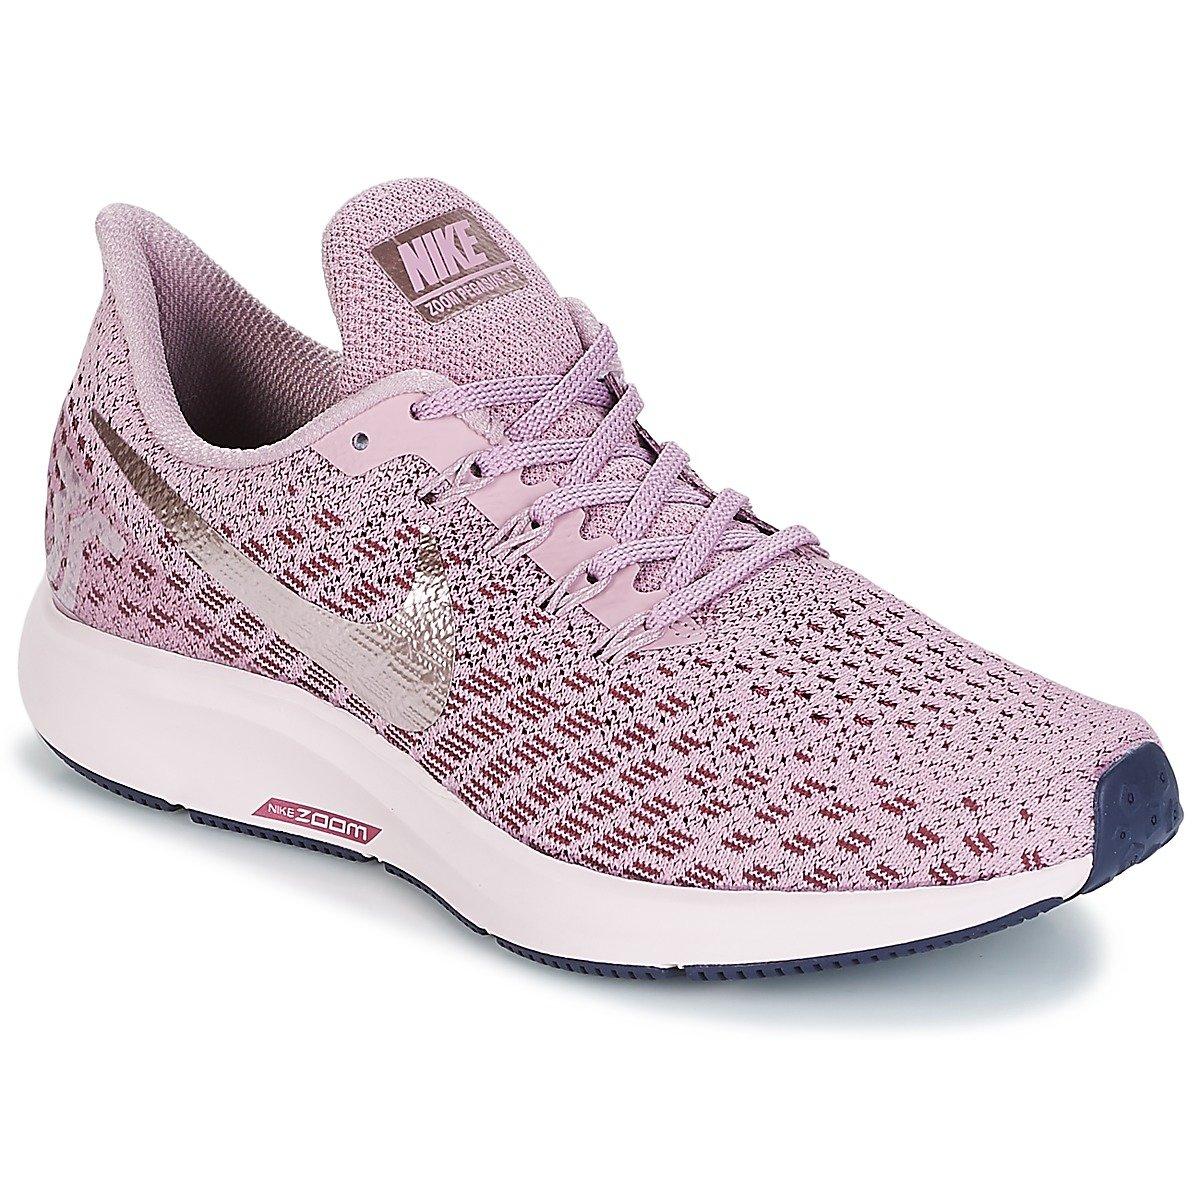 Nike Womens Air Zoom Pegasus 35 Running Shoes B075ZY4XVC 11 B(M) US|Elemental Rose/Barely Rose